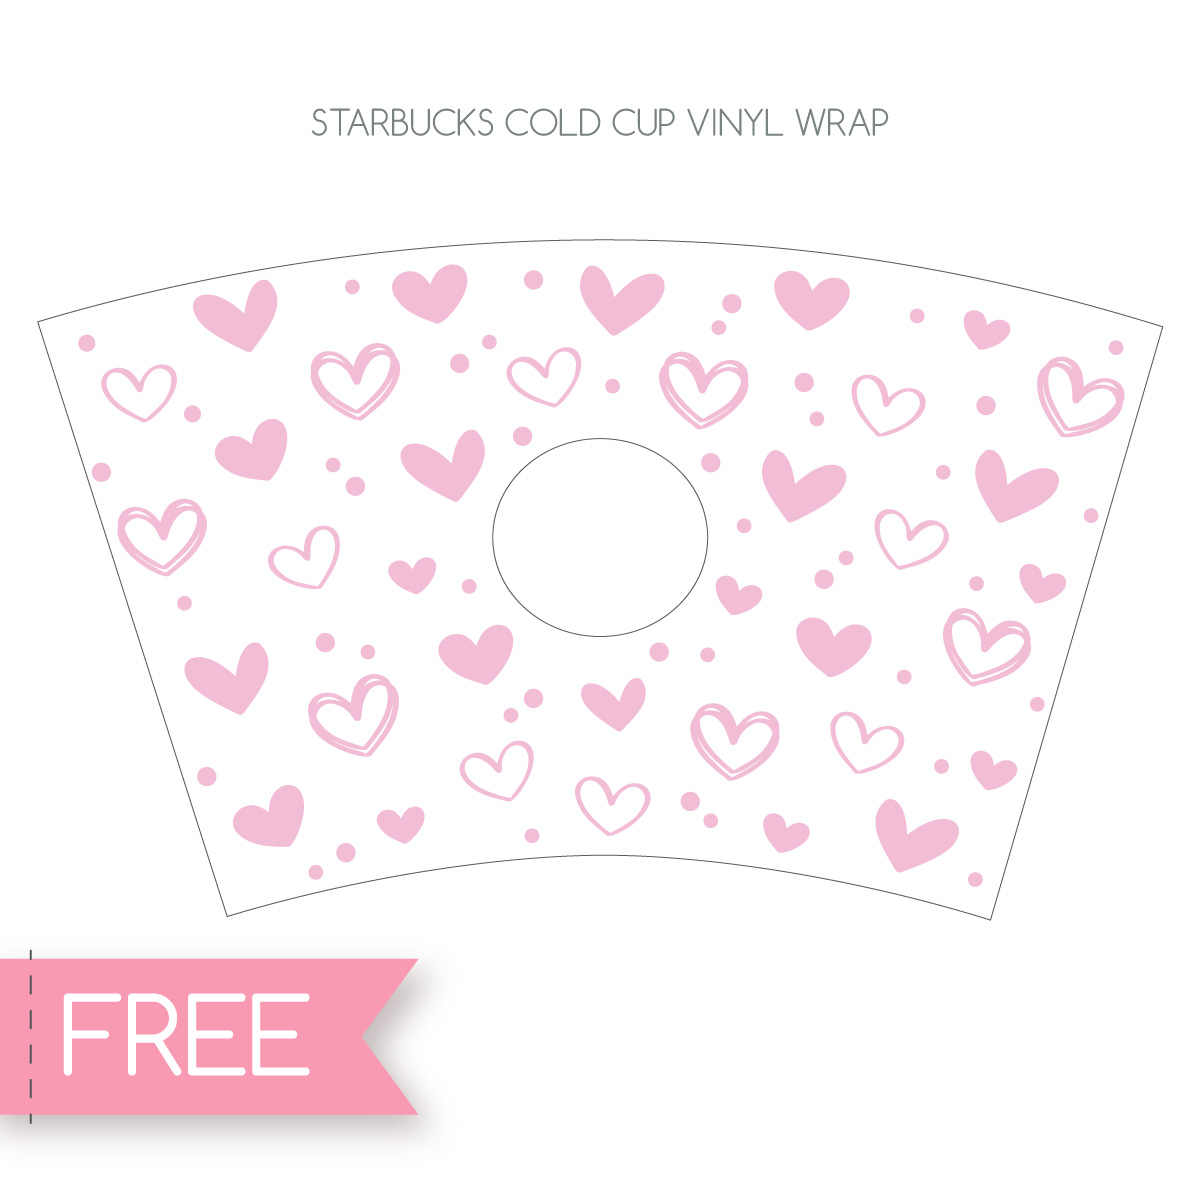 Starbucks cup full wrap Cricut SVG cut file